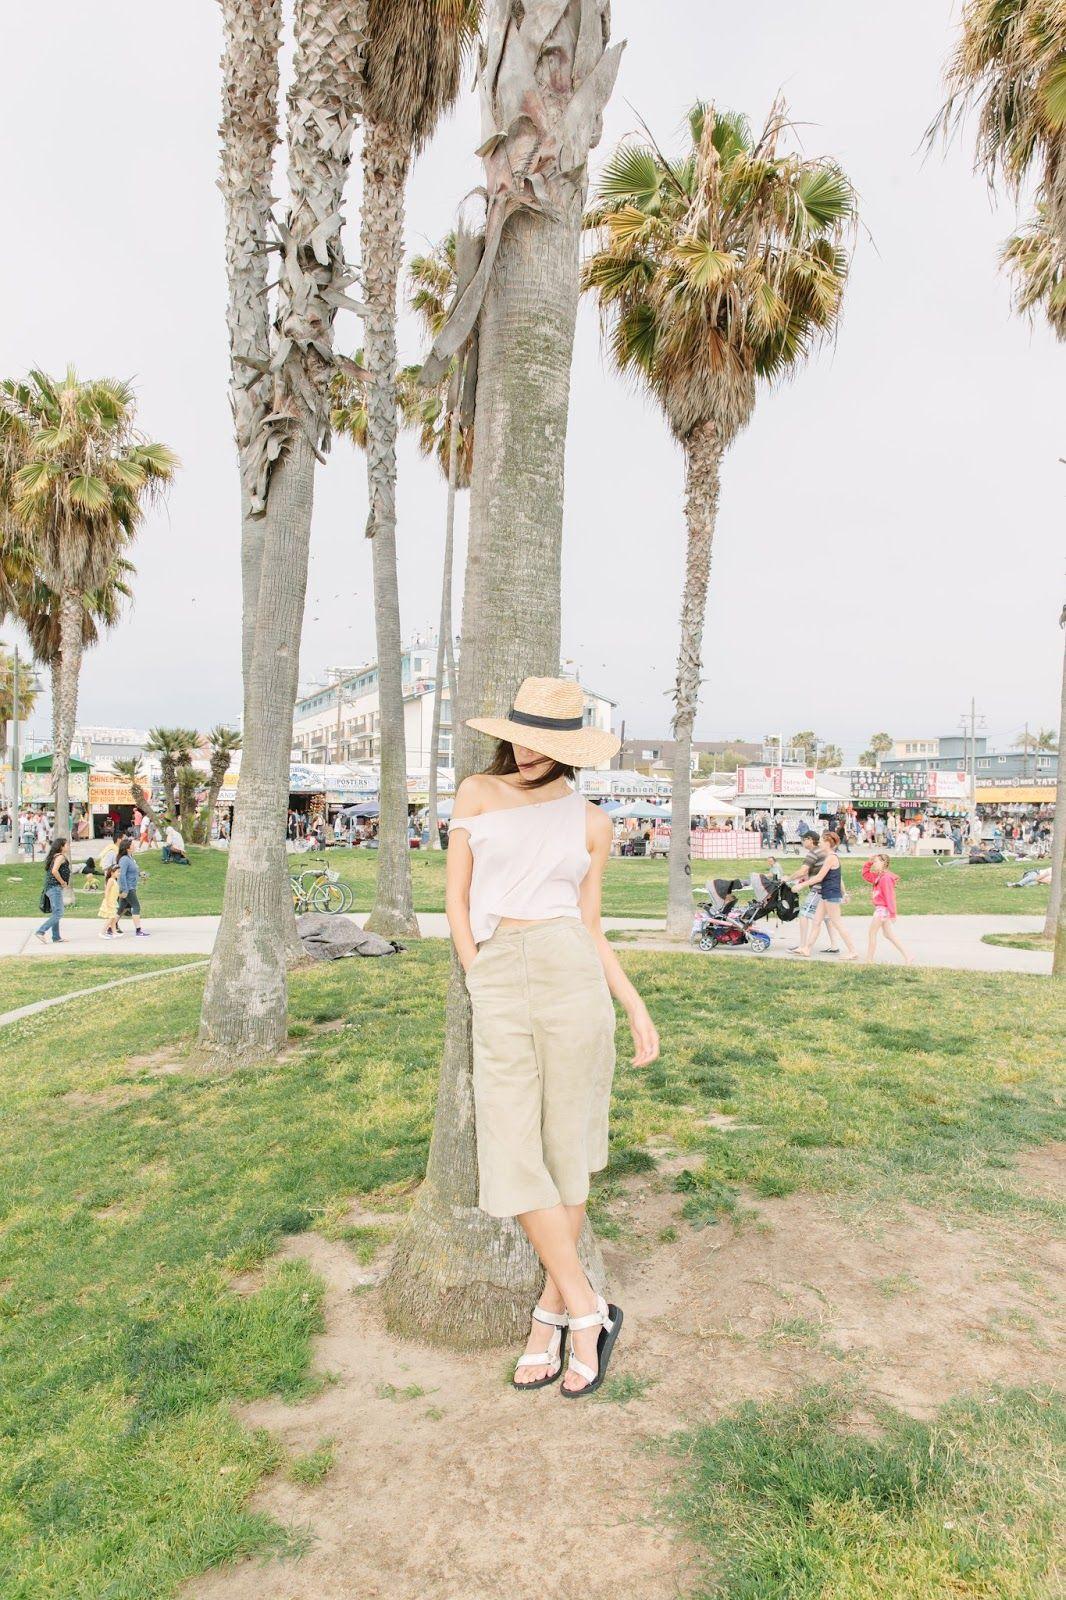 Teva metallic sandals + neutral outfit <3 | West coast